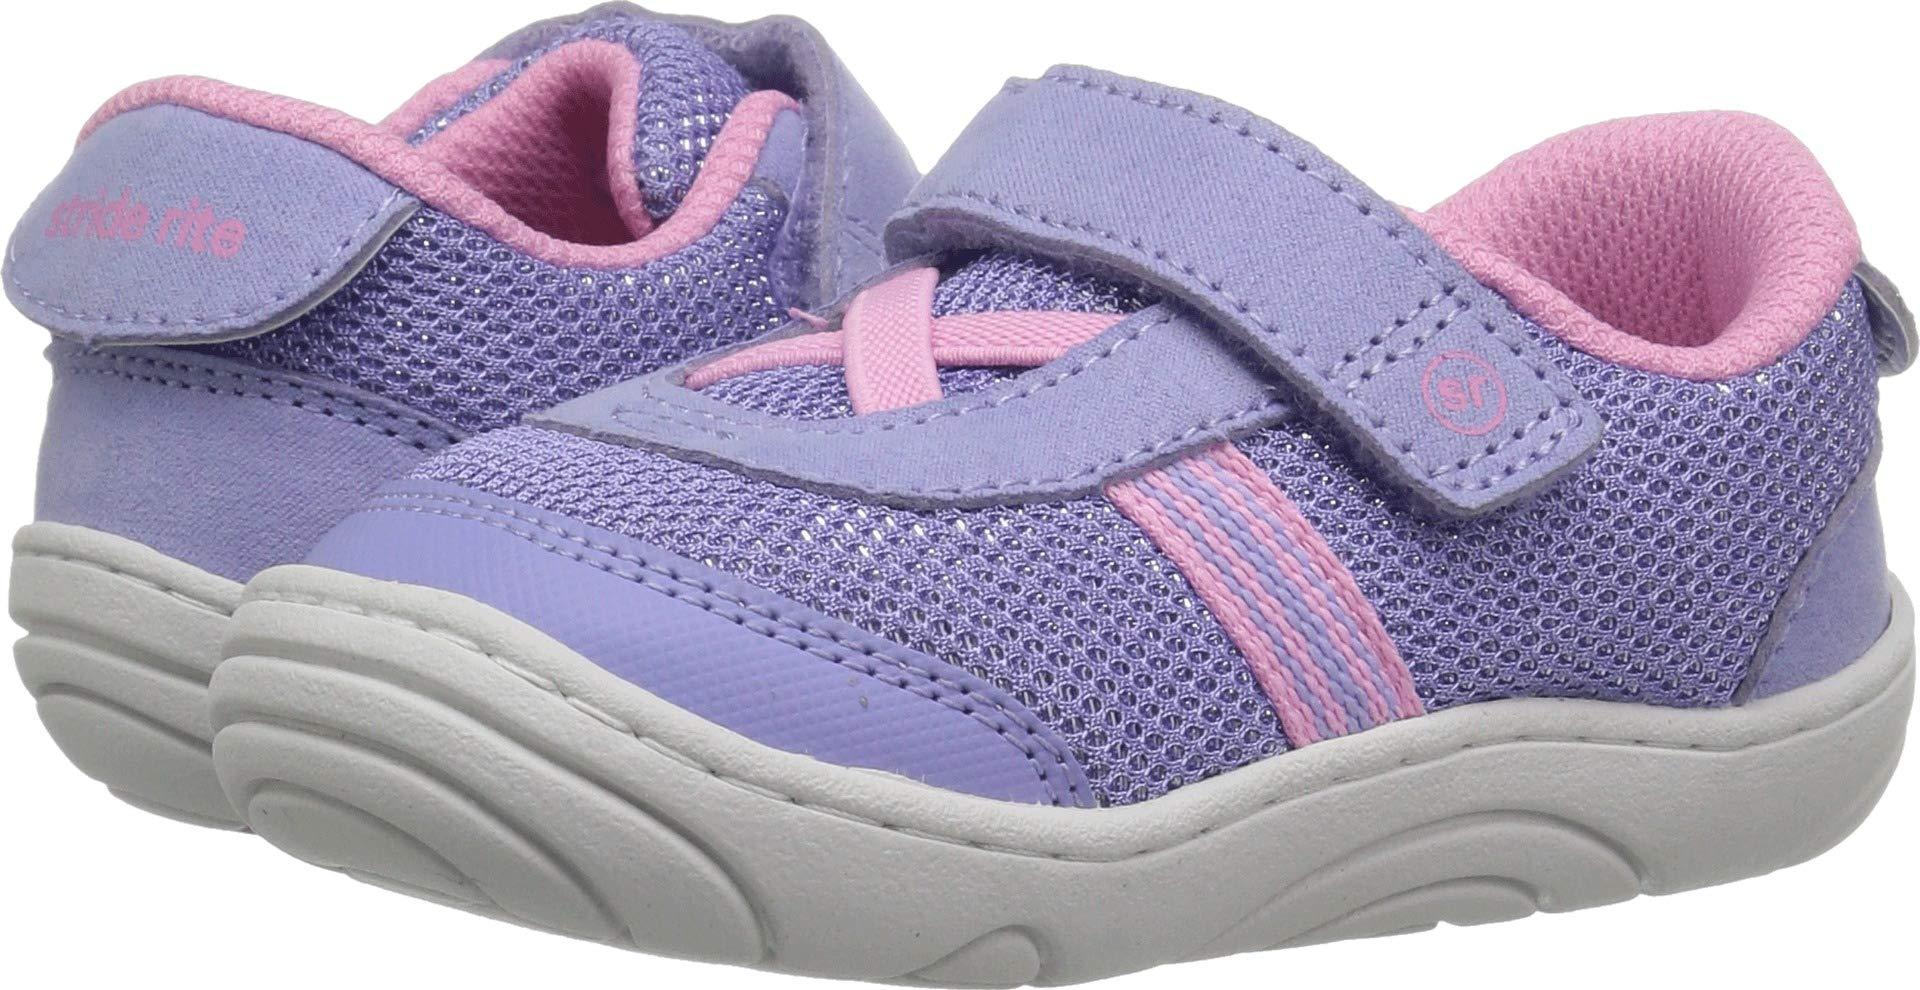 Stride Rite Girls' SR-Jackson Sneaker, Purple/Pink, 6 M US Toddler by Stride Rite